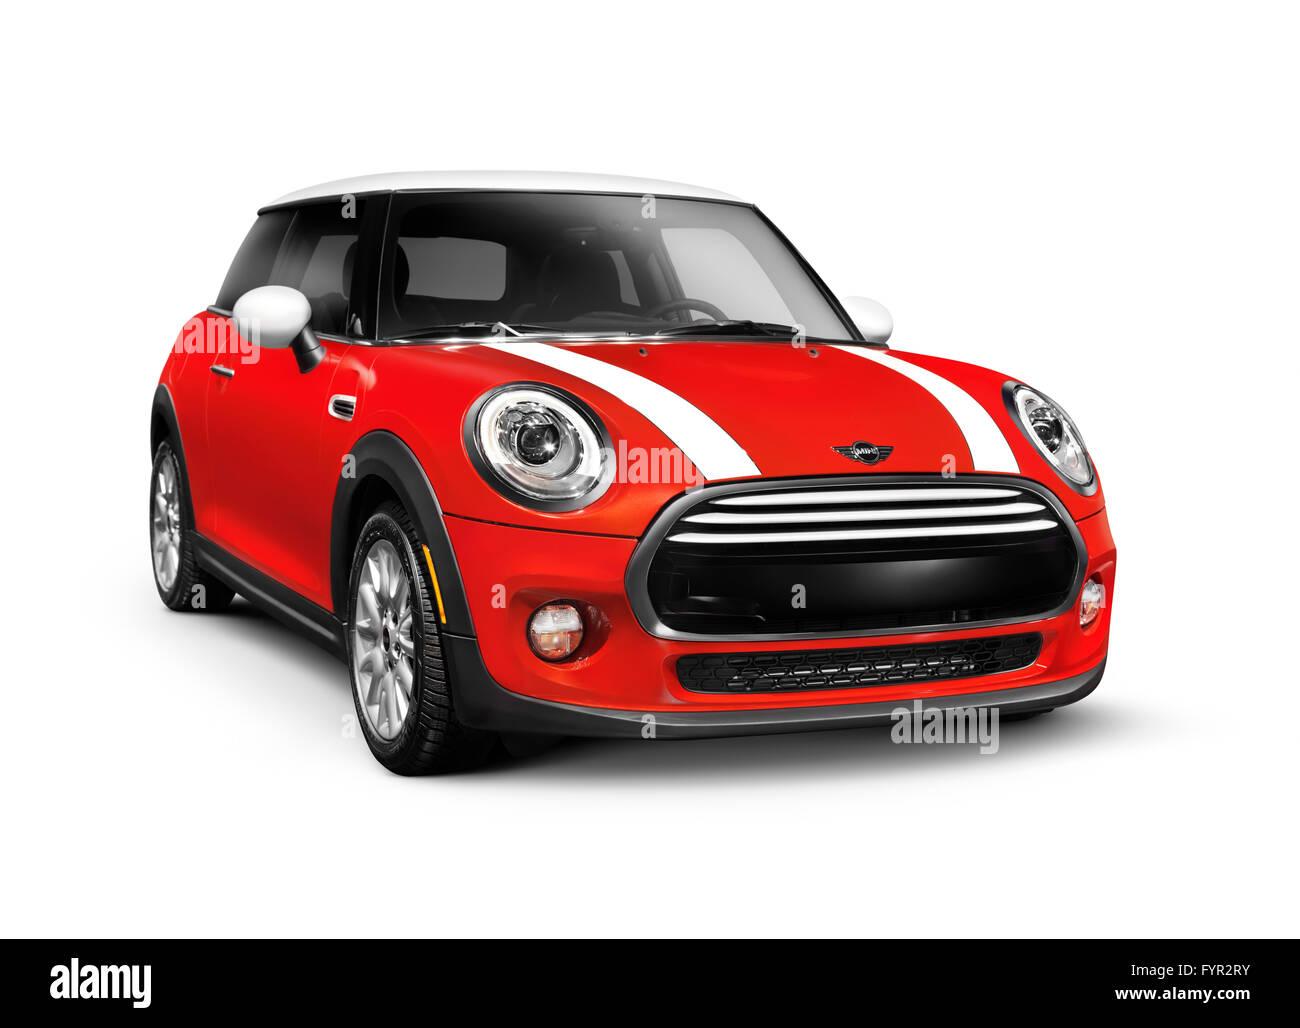 Rojo 2014 Mini Cooper Hardtop ciudad compacta coche Imagen De Stock